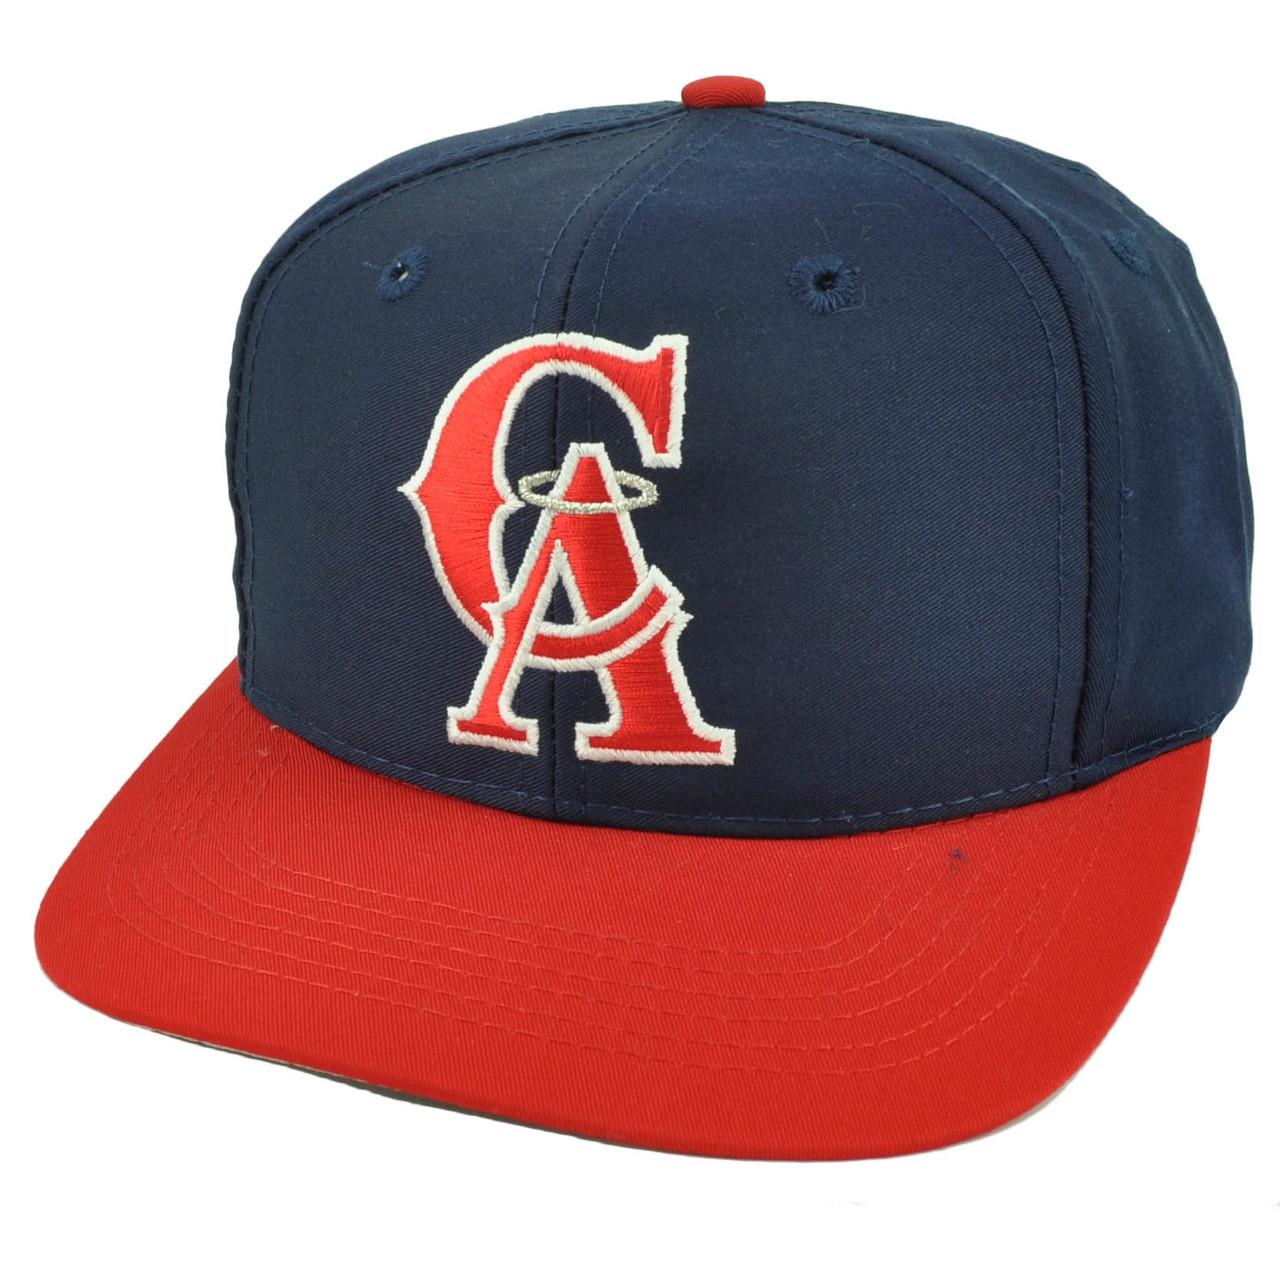 ff6155bcd93054 Los Angeles Angels Old School Logo Snapback Flat Bill Baseball Hat Cap  Youth - Cap Store Online.com